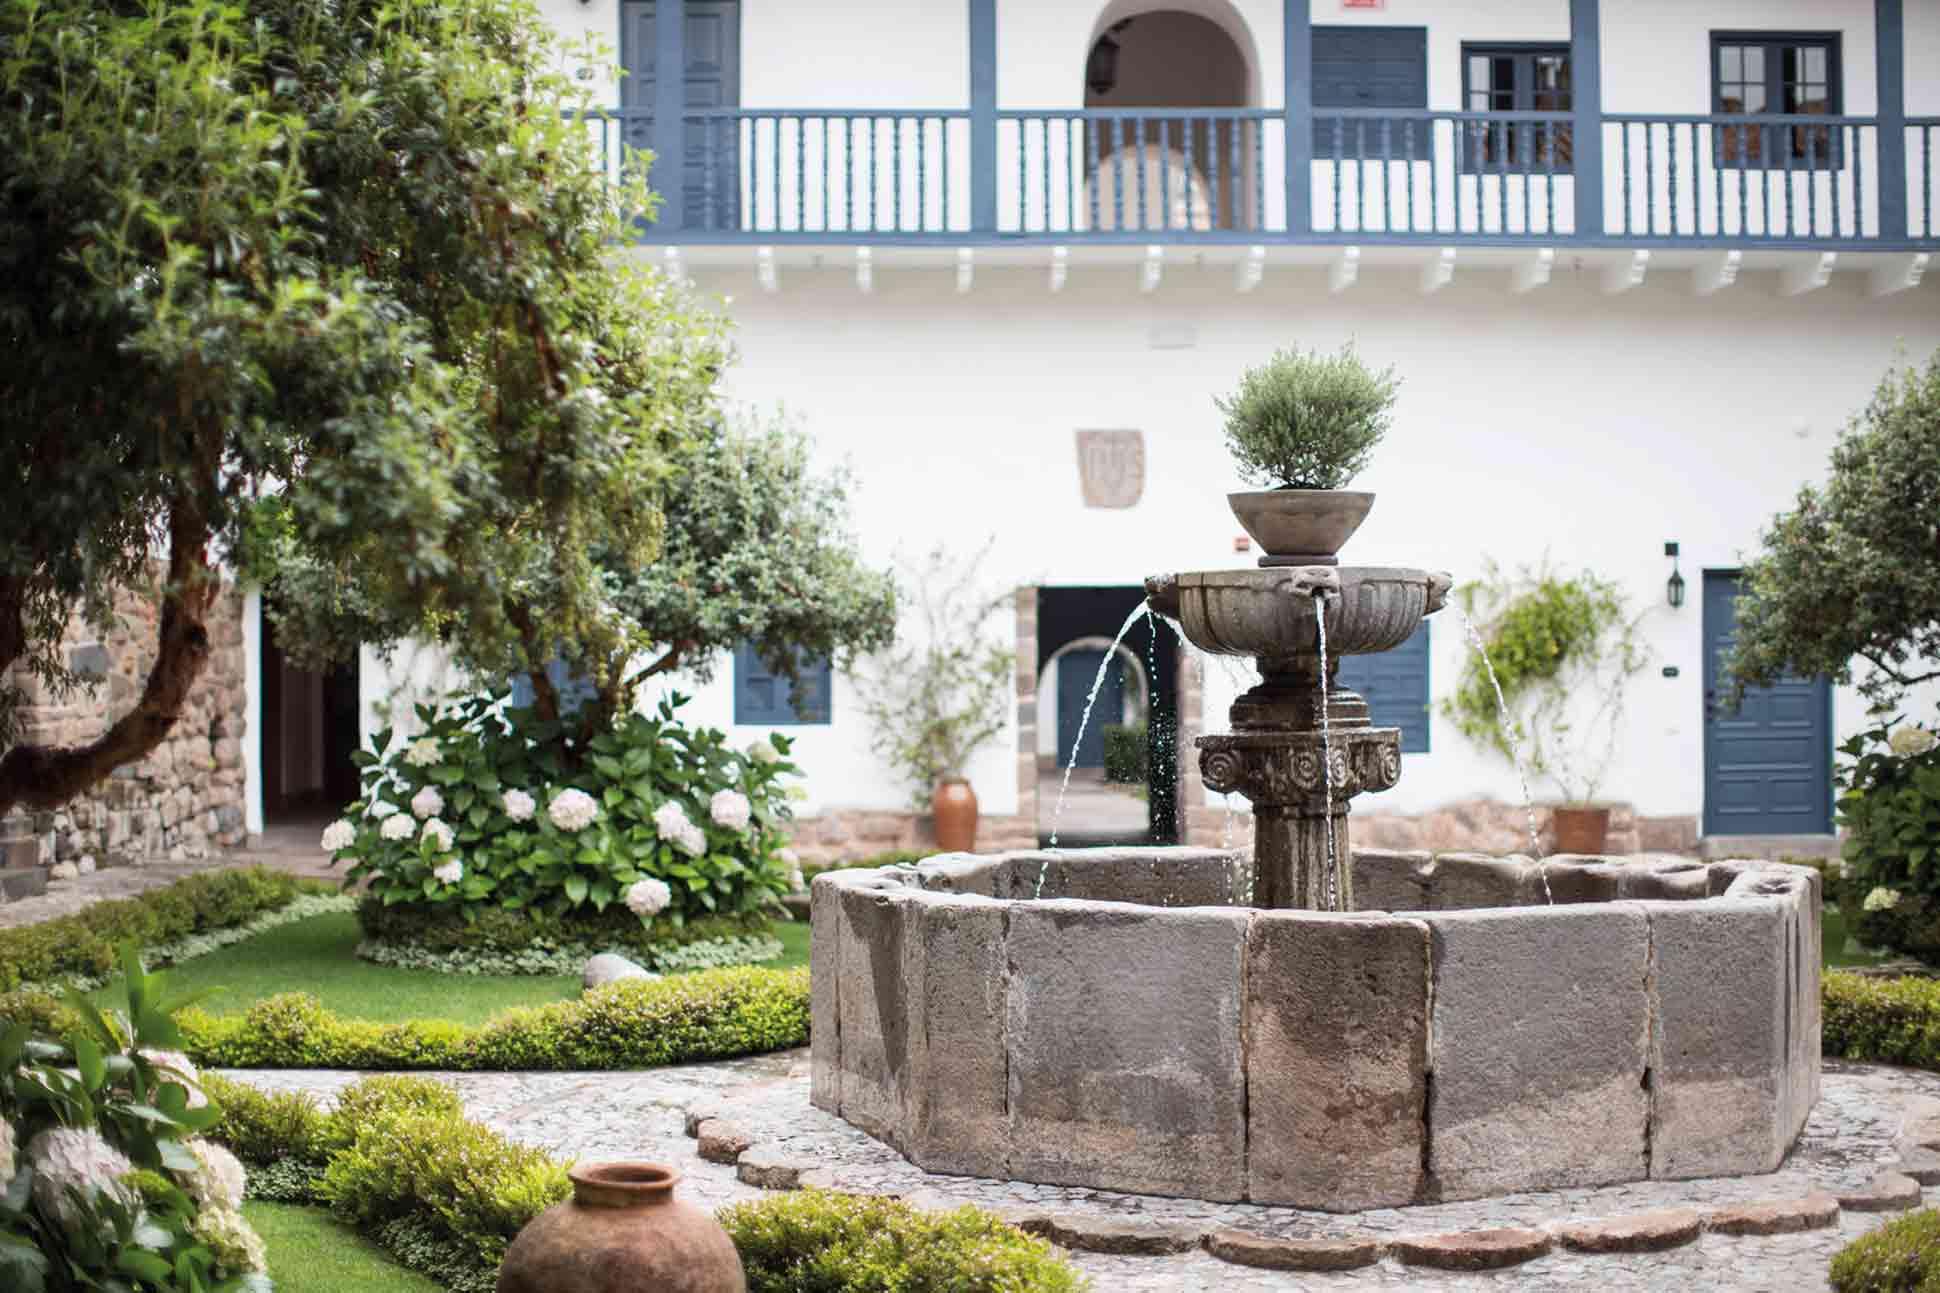 Belmond Palacio Nazarenas courtyard